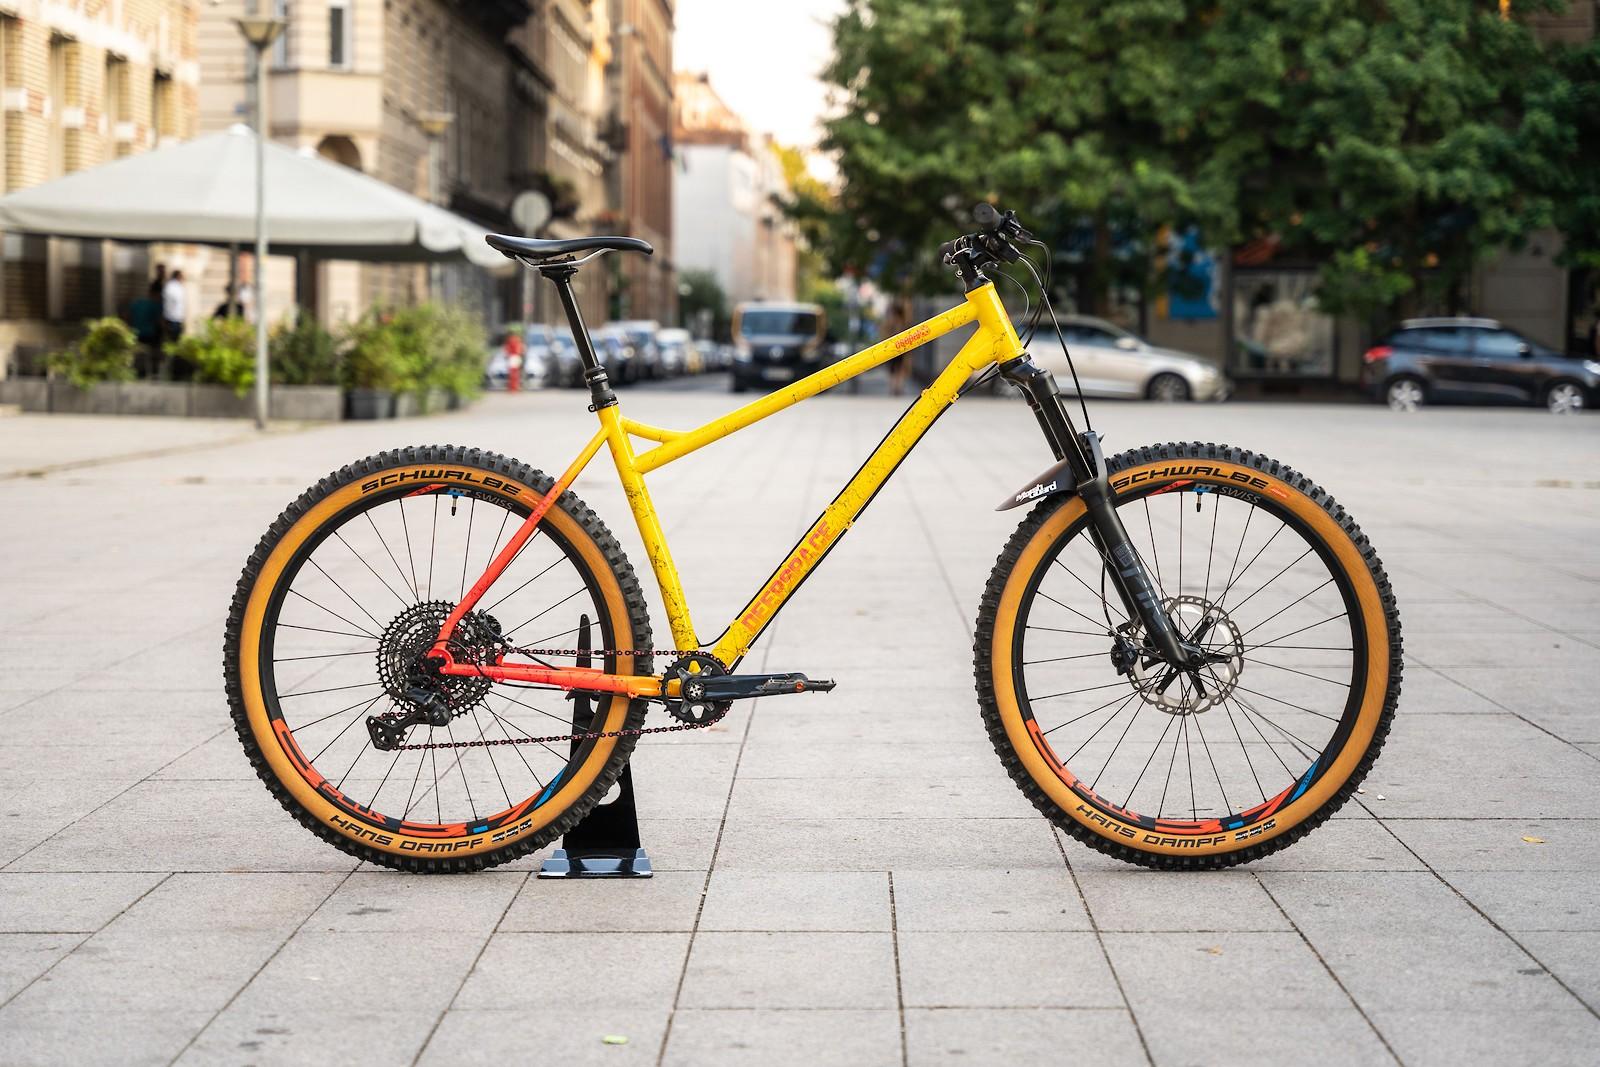 Csepel Deepspace Kckss - Vital Bike of the Day October 2021 - Mountain Biking Pictures - Vital MTB